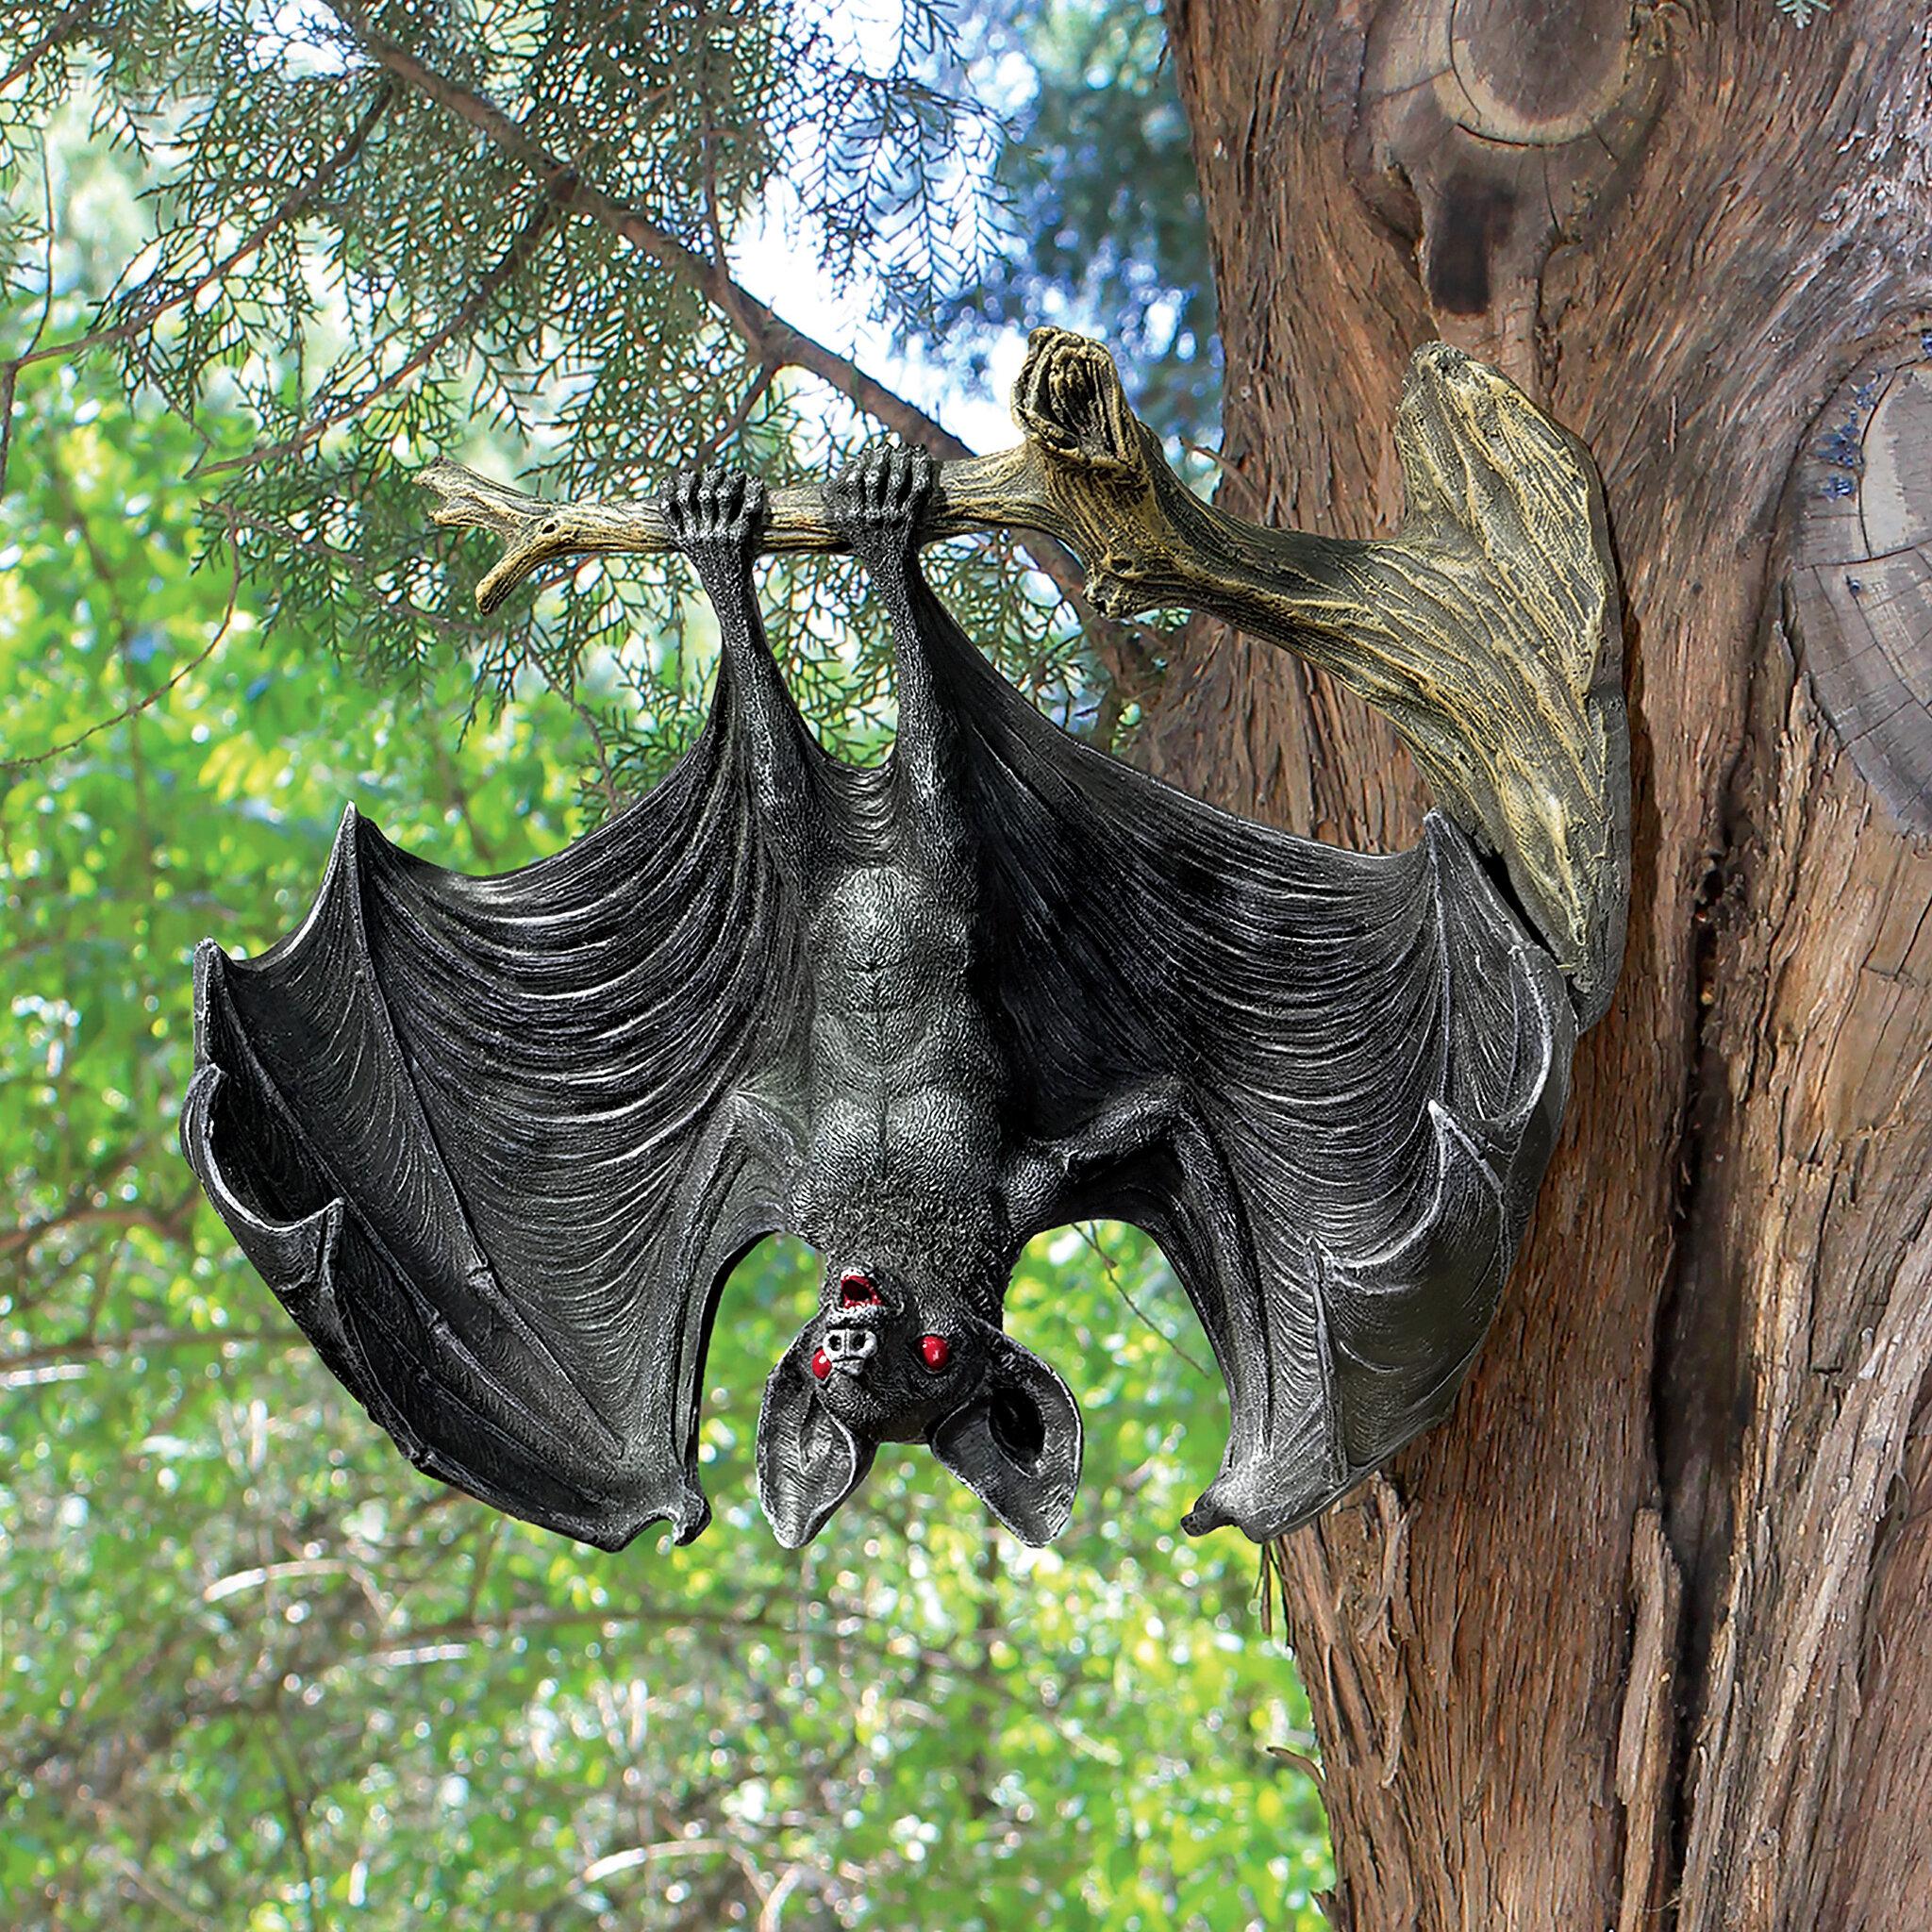 Bat Greenhouse Design Html on